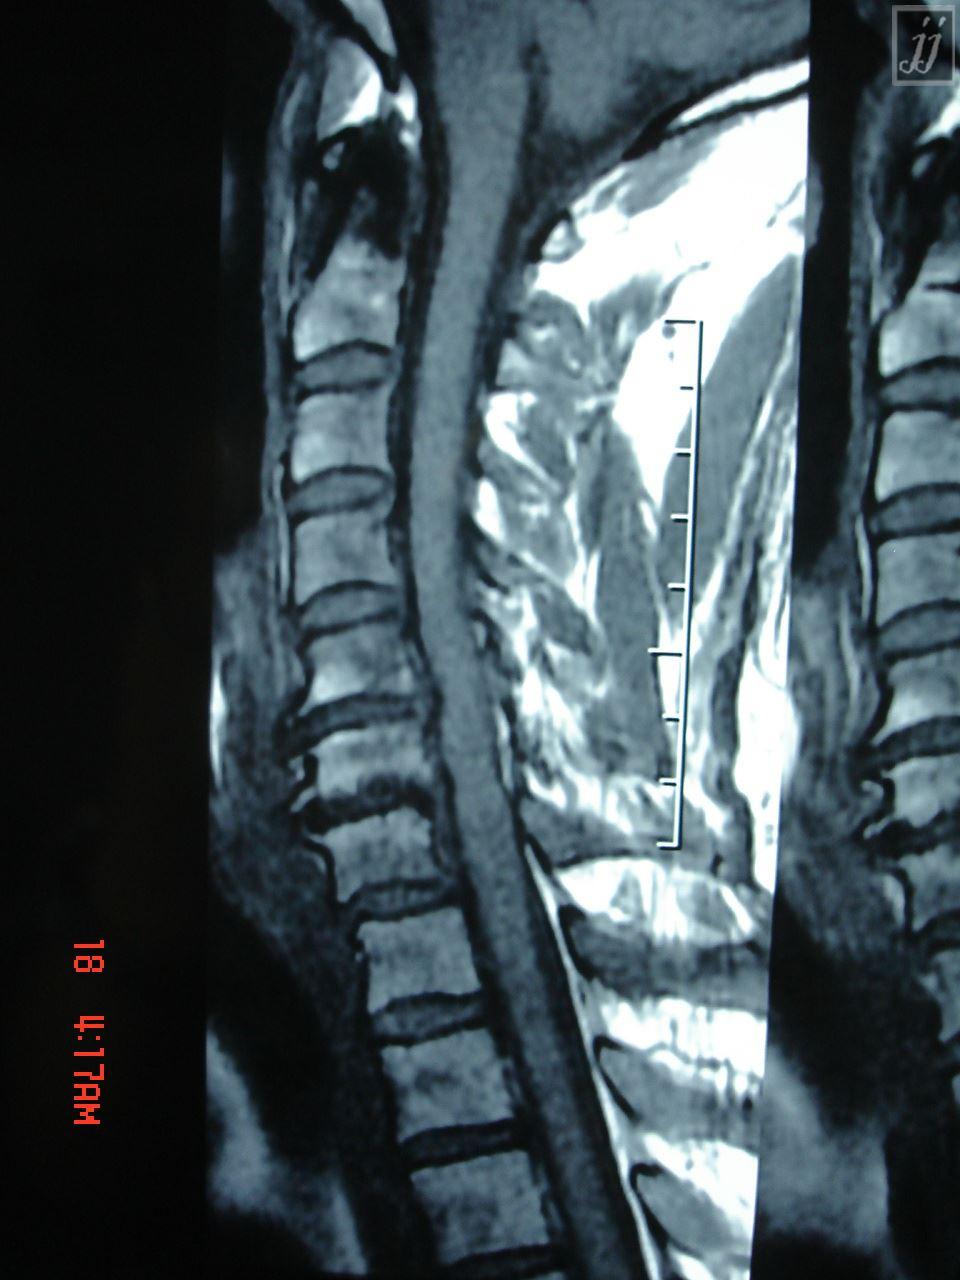 Radioogle Spine C6 C7 Disc Herniation And Cord Gliosis 5